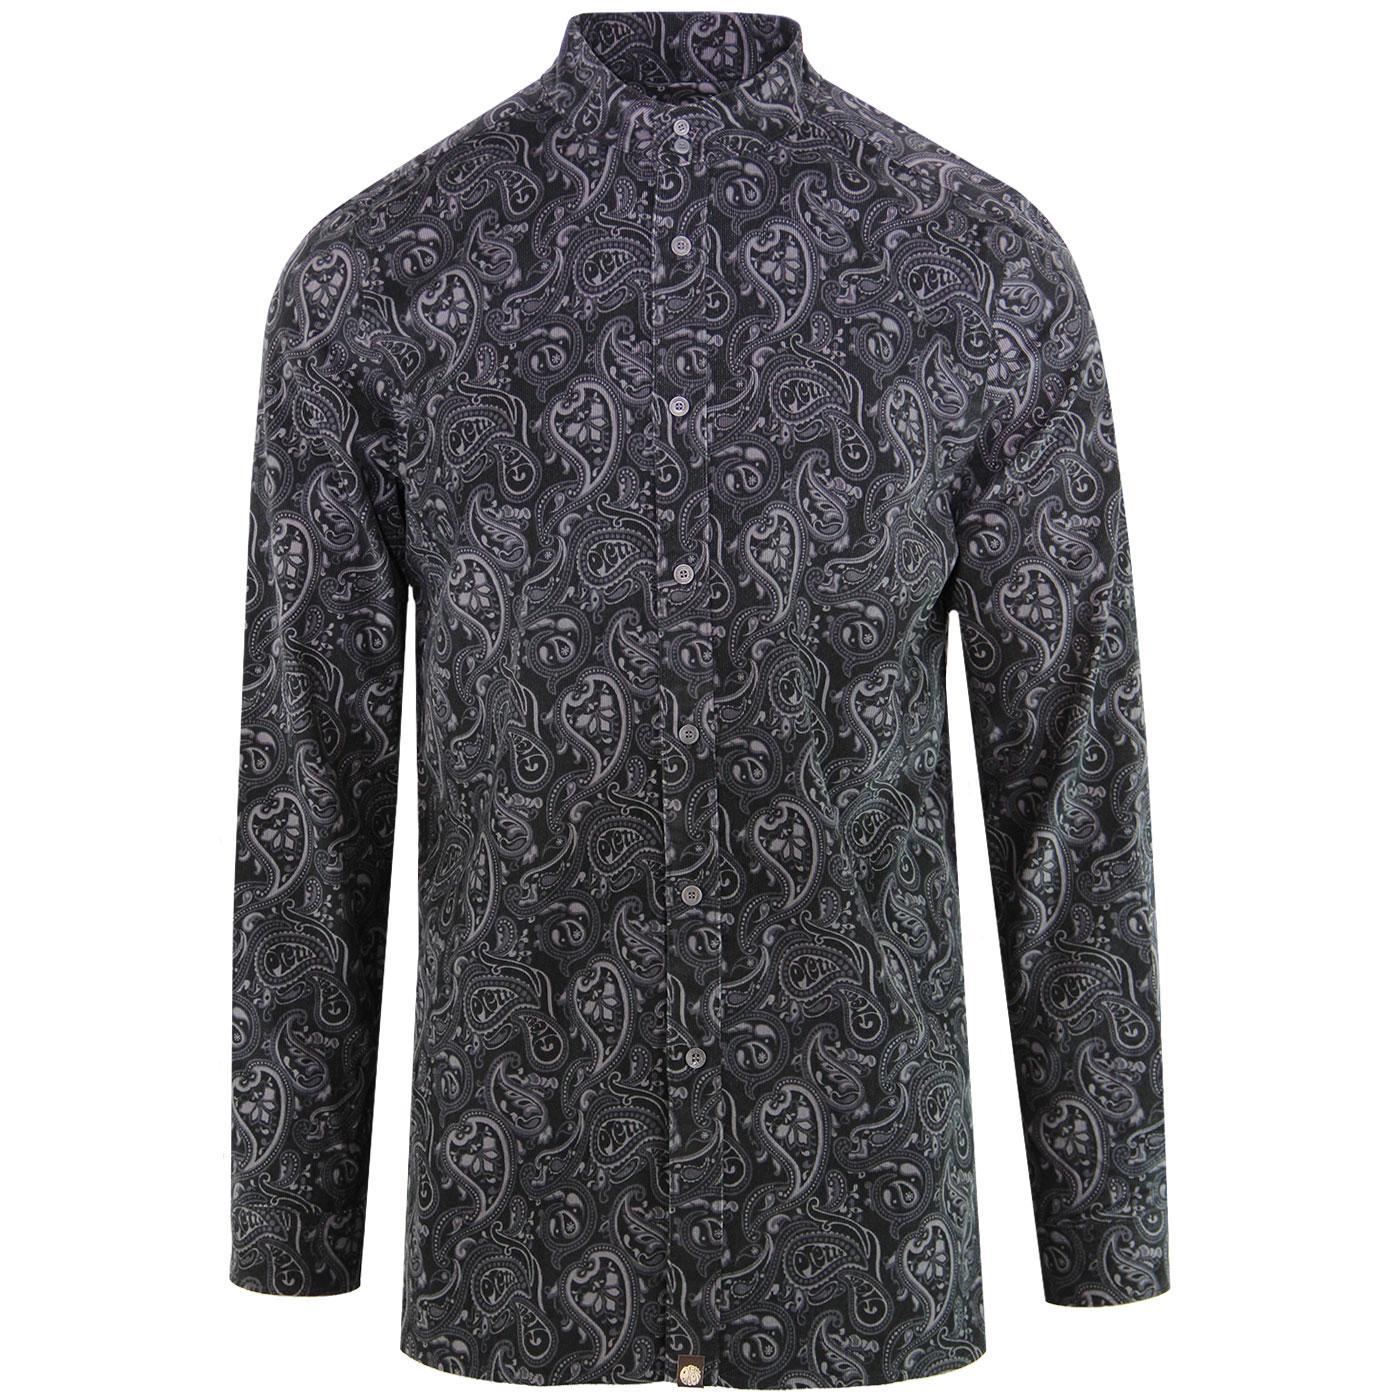 PRETTY GREEN 60s Mod Paisley Cord Kaftan Shirt (B)